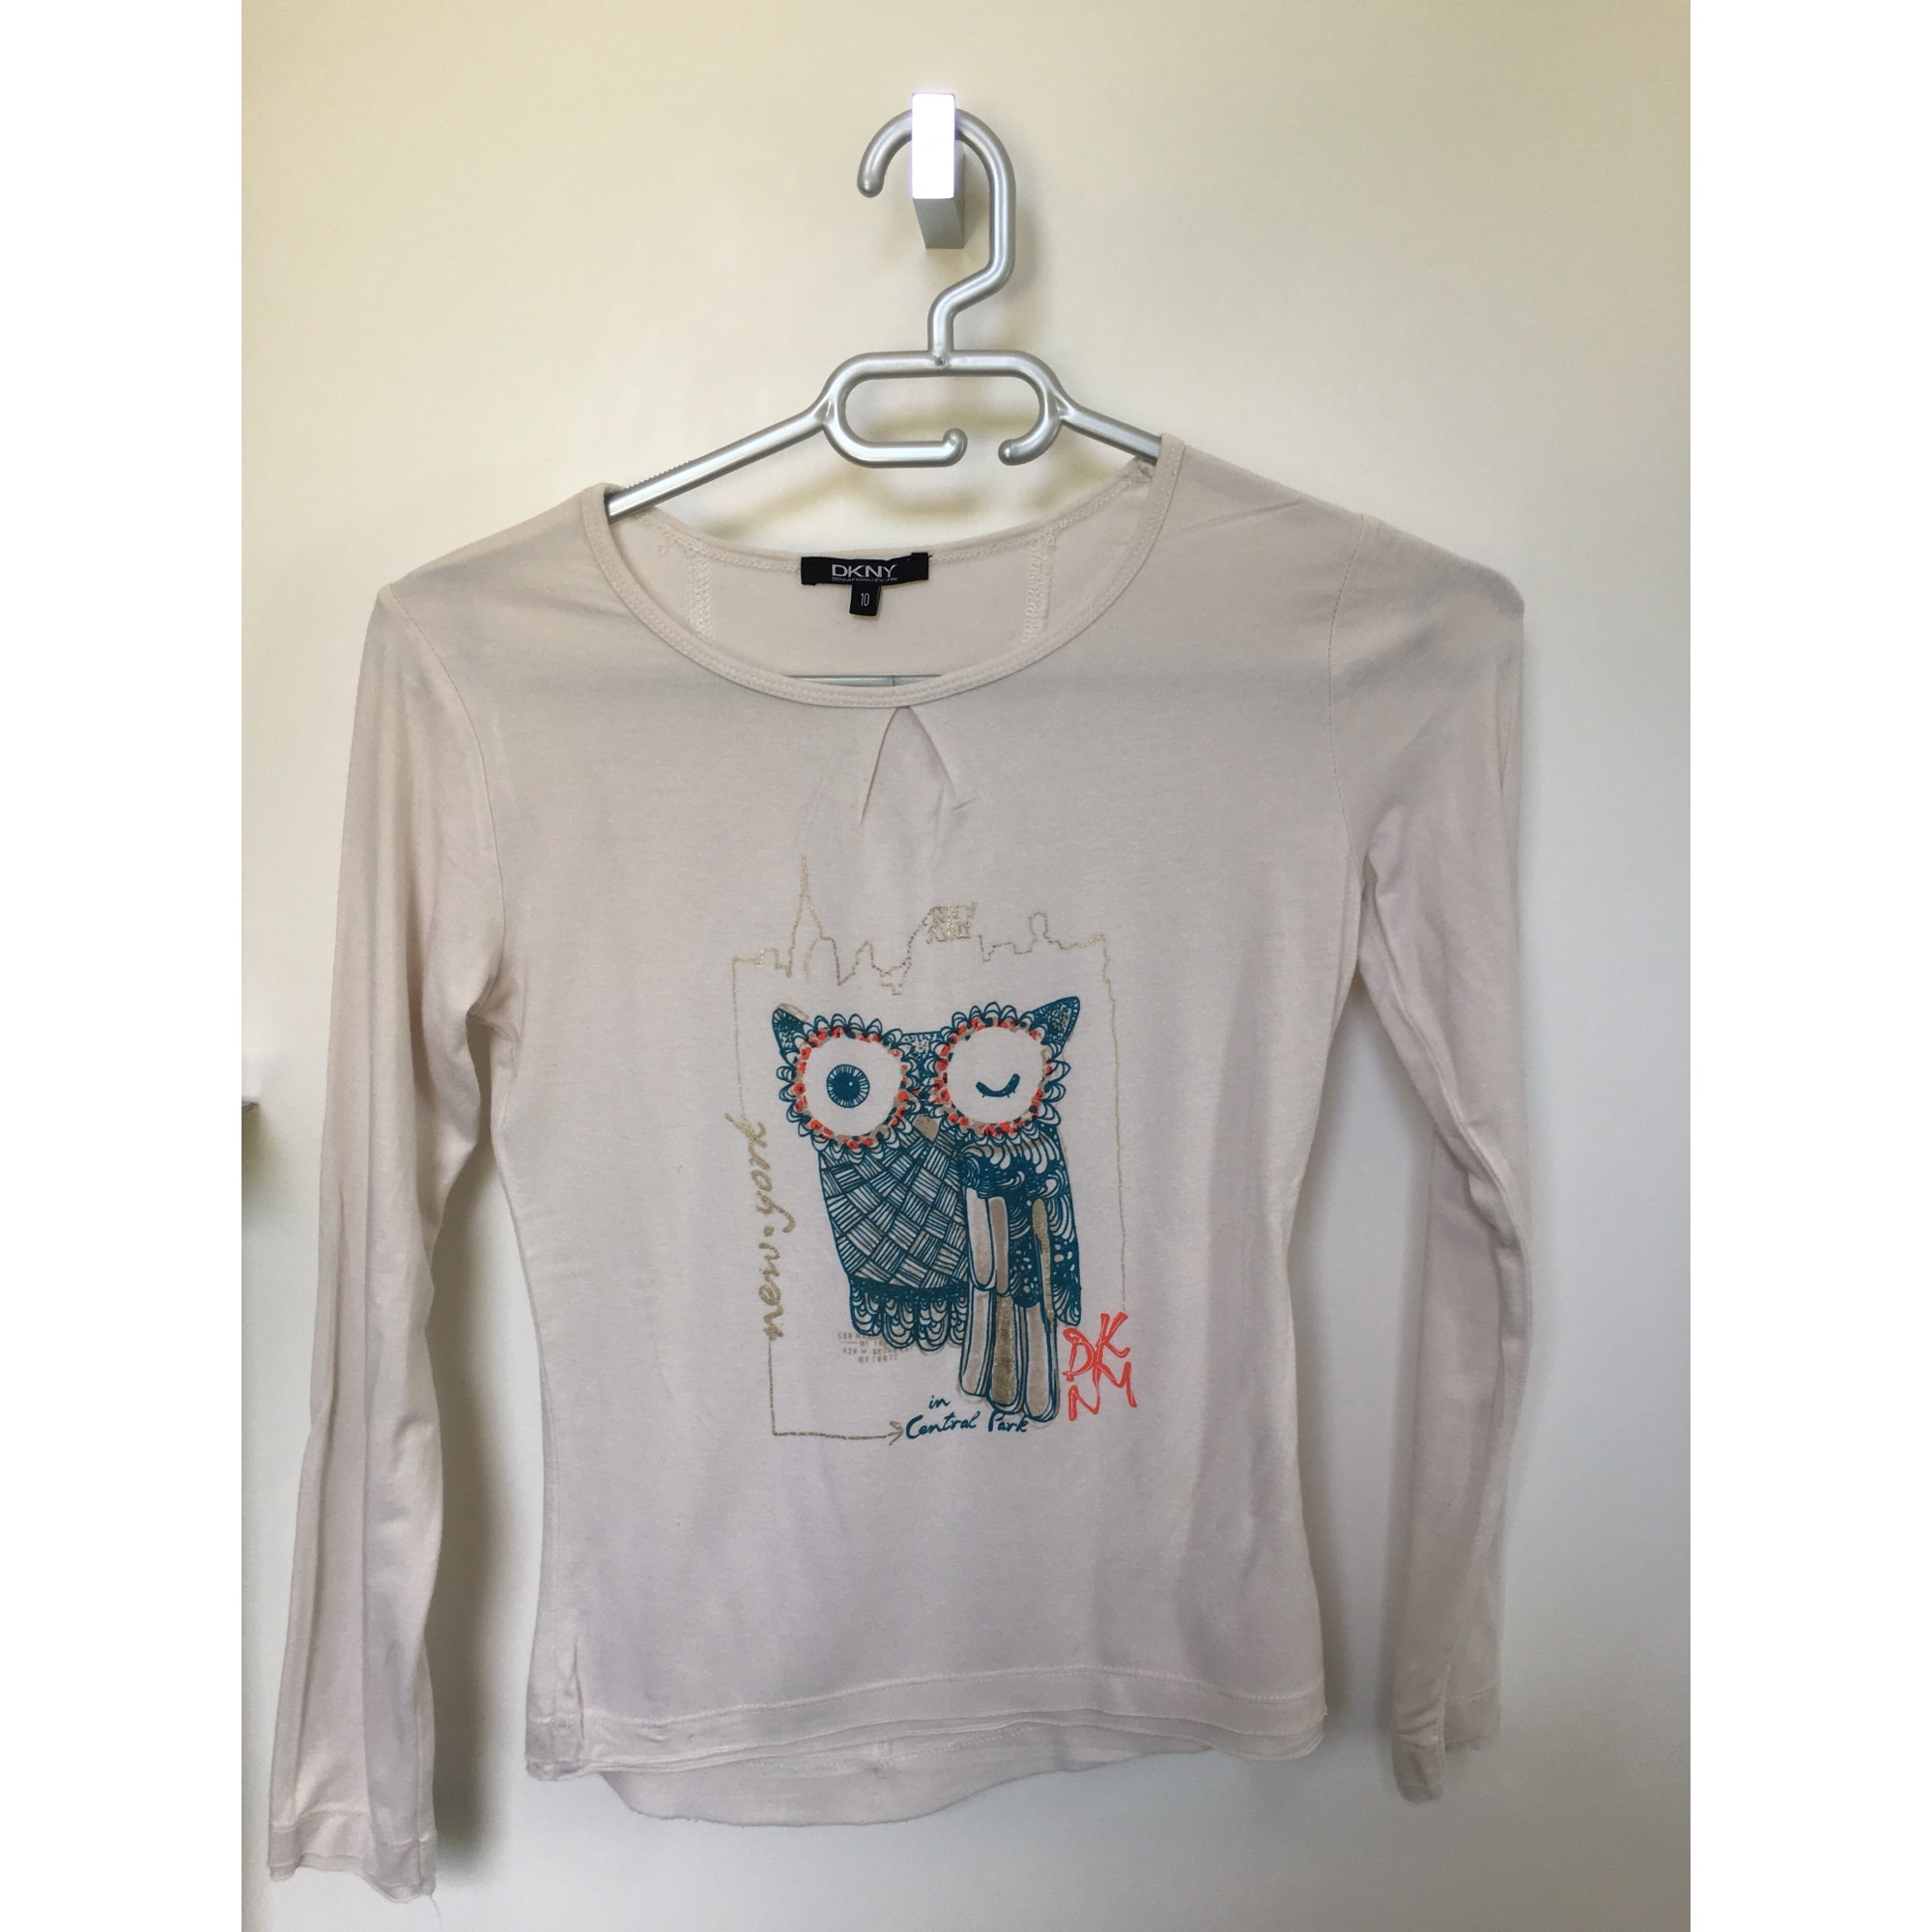 Top, Tee-shirt DKNY Beige, camel